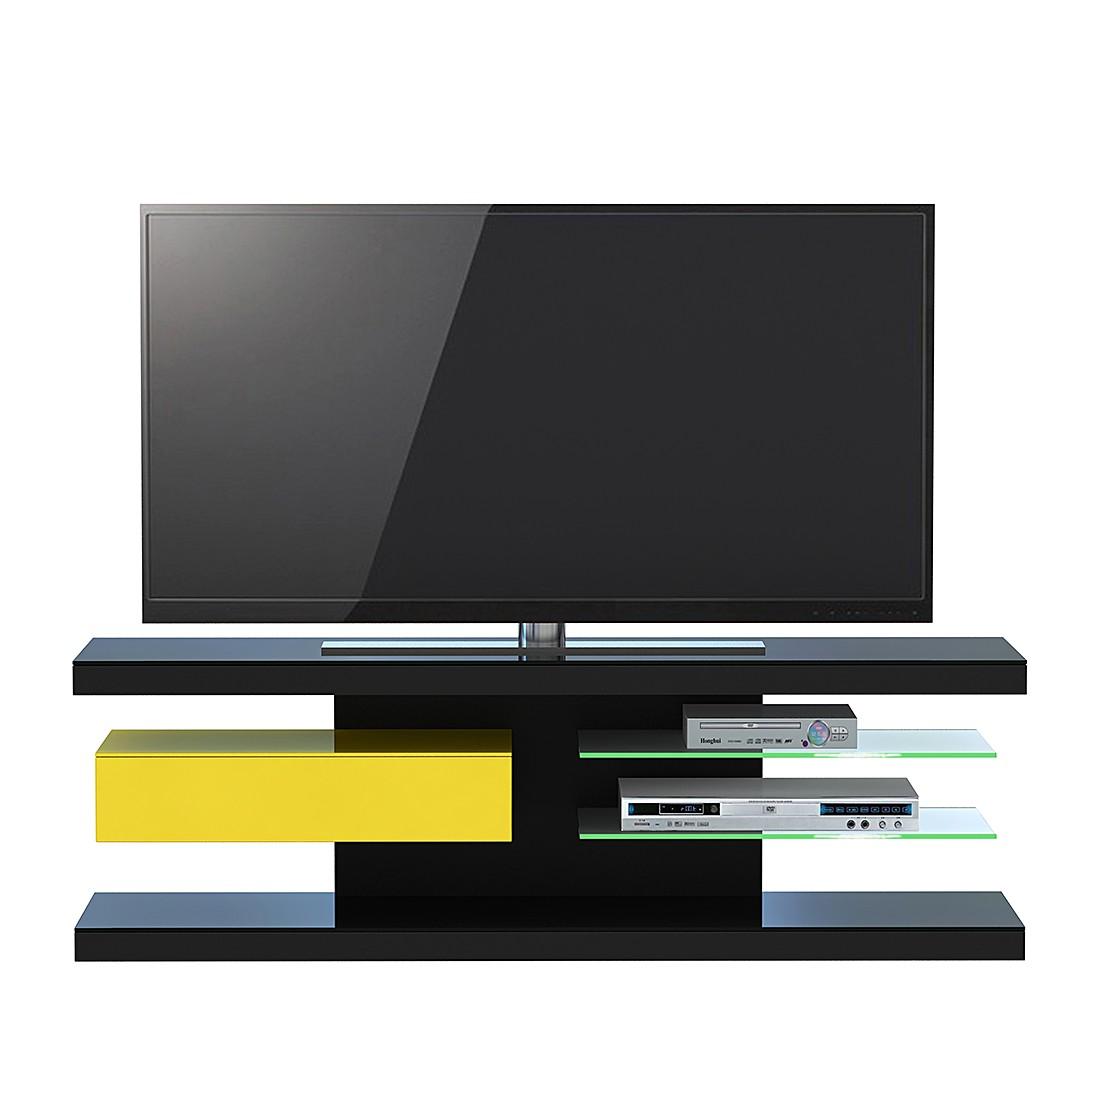 TV-Rack SL 660 - Schwarz / Gelb, Jahnke